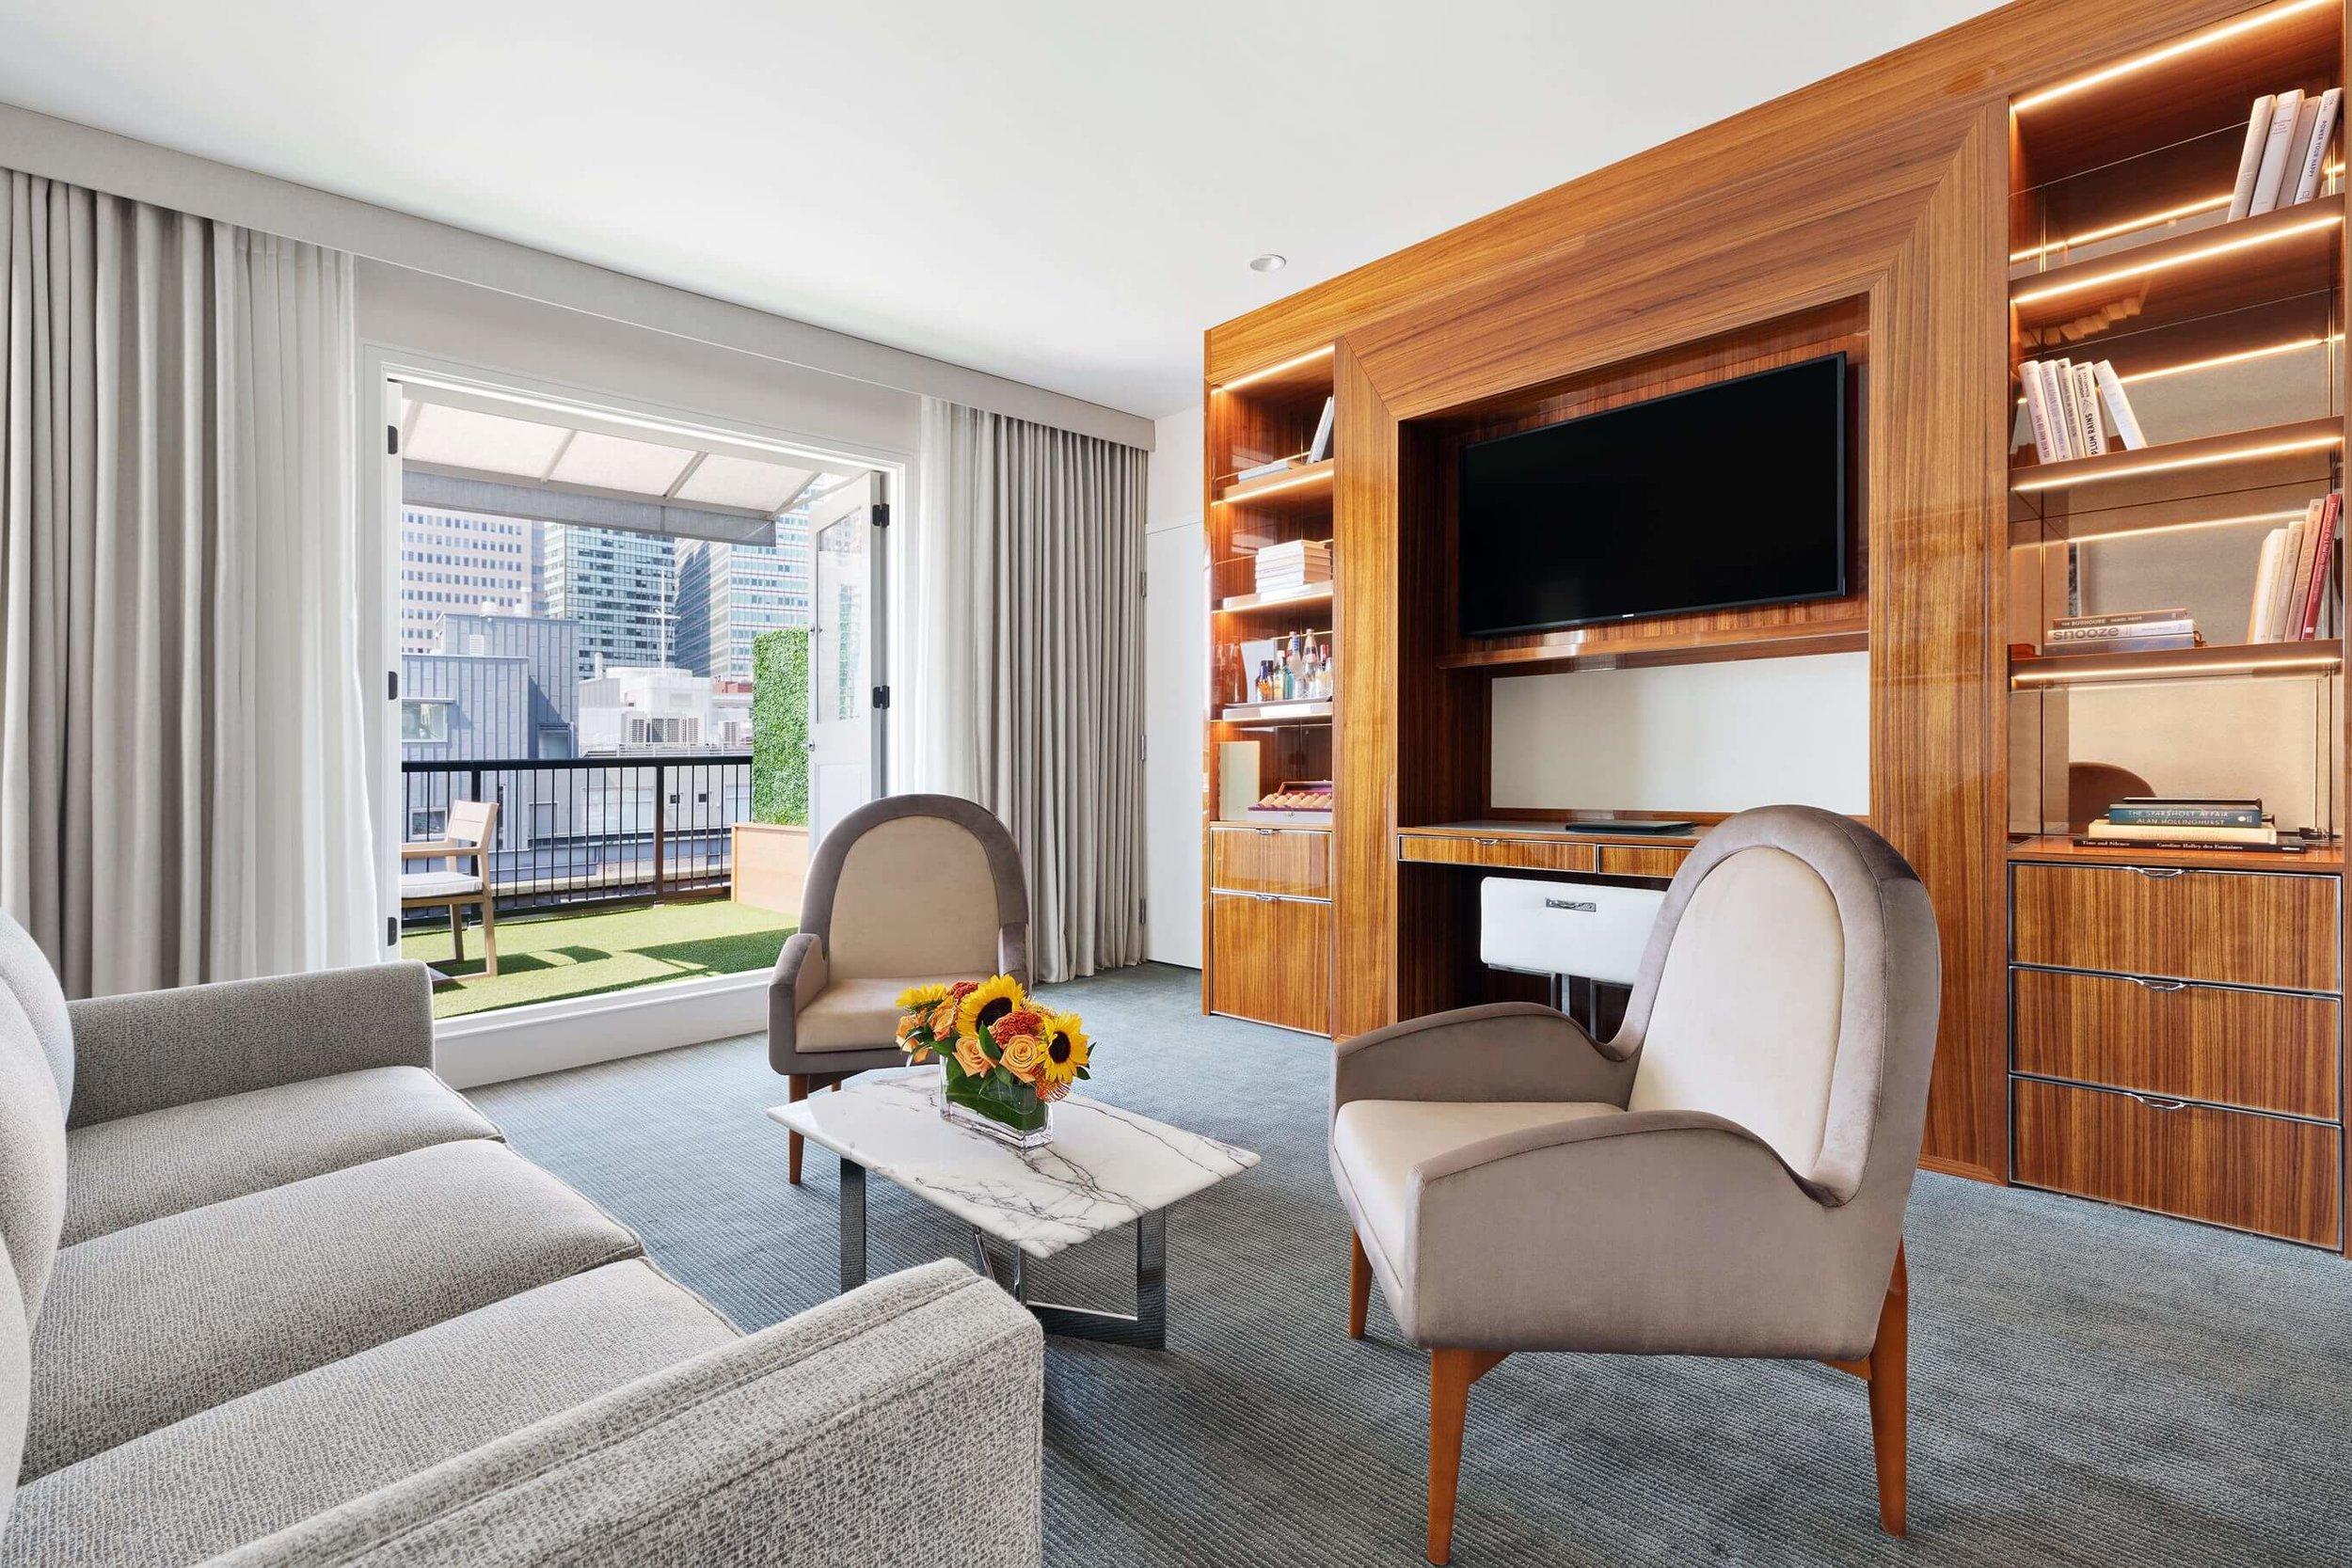 ddp_1365_compressed-c-suite-living-room.jpg